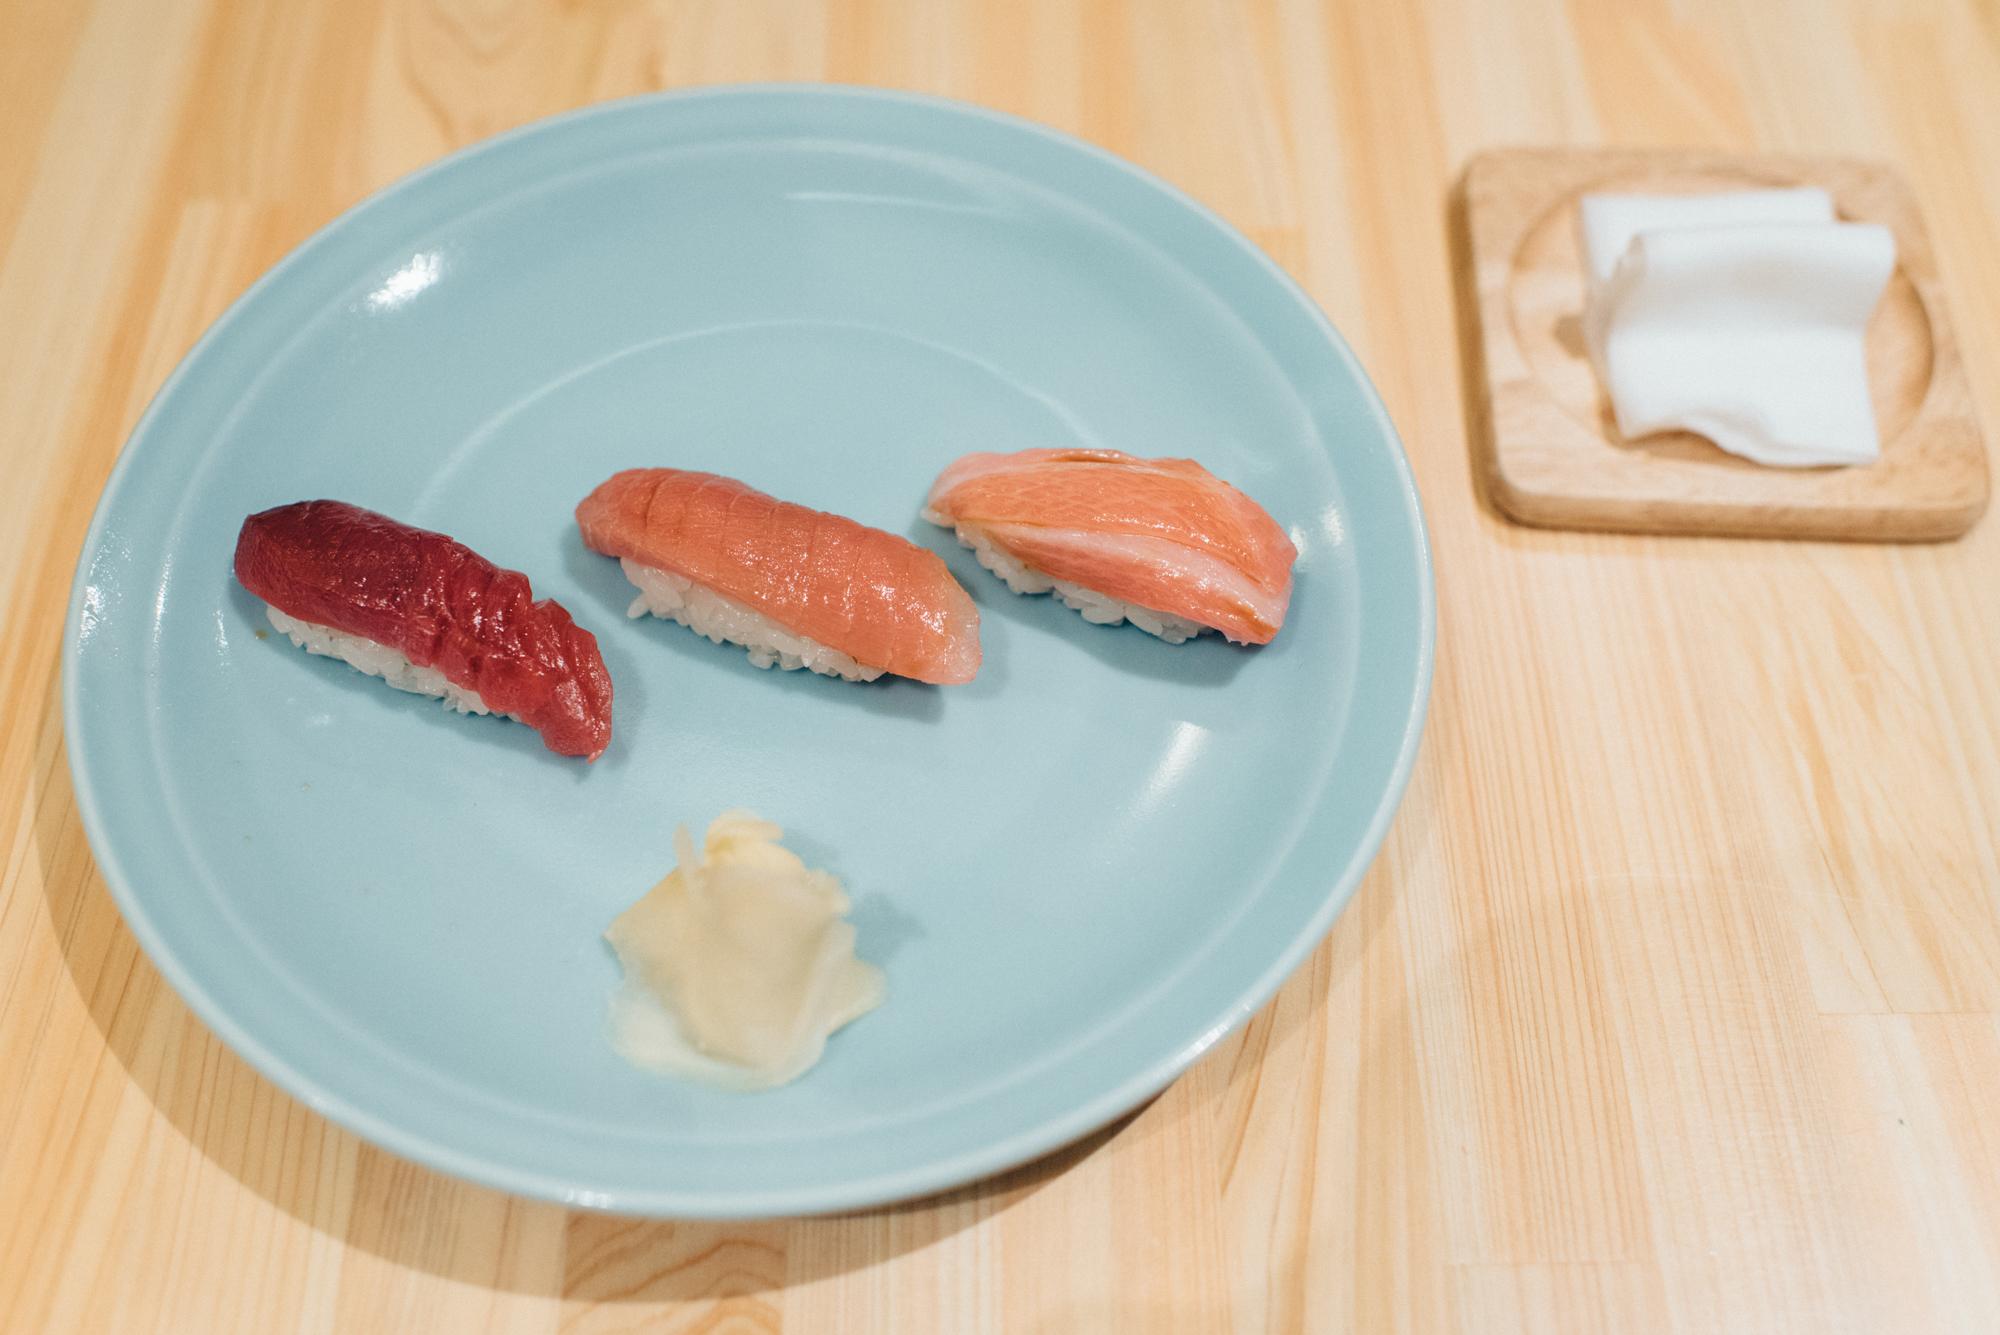 toronto-omakase-sushi-shoushin-15.jpg